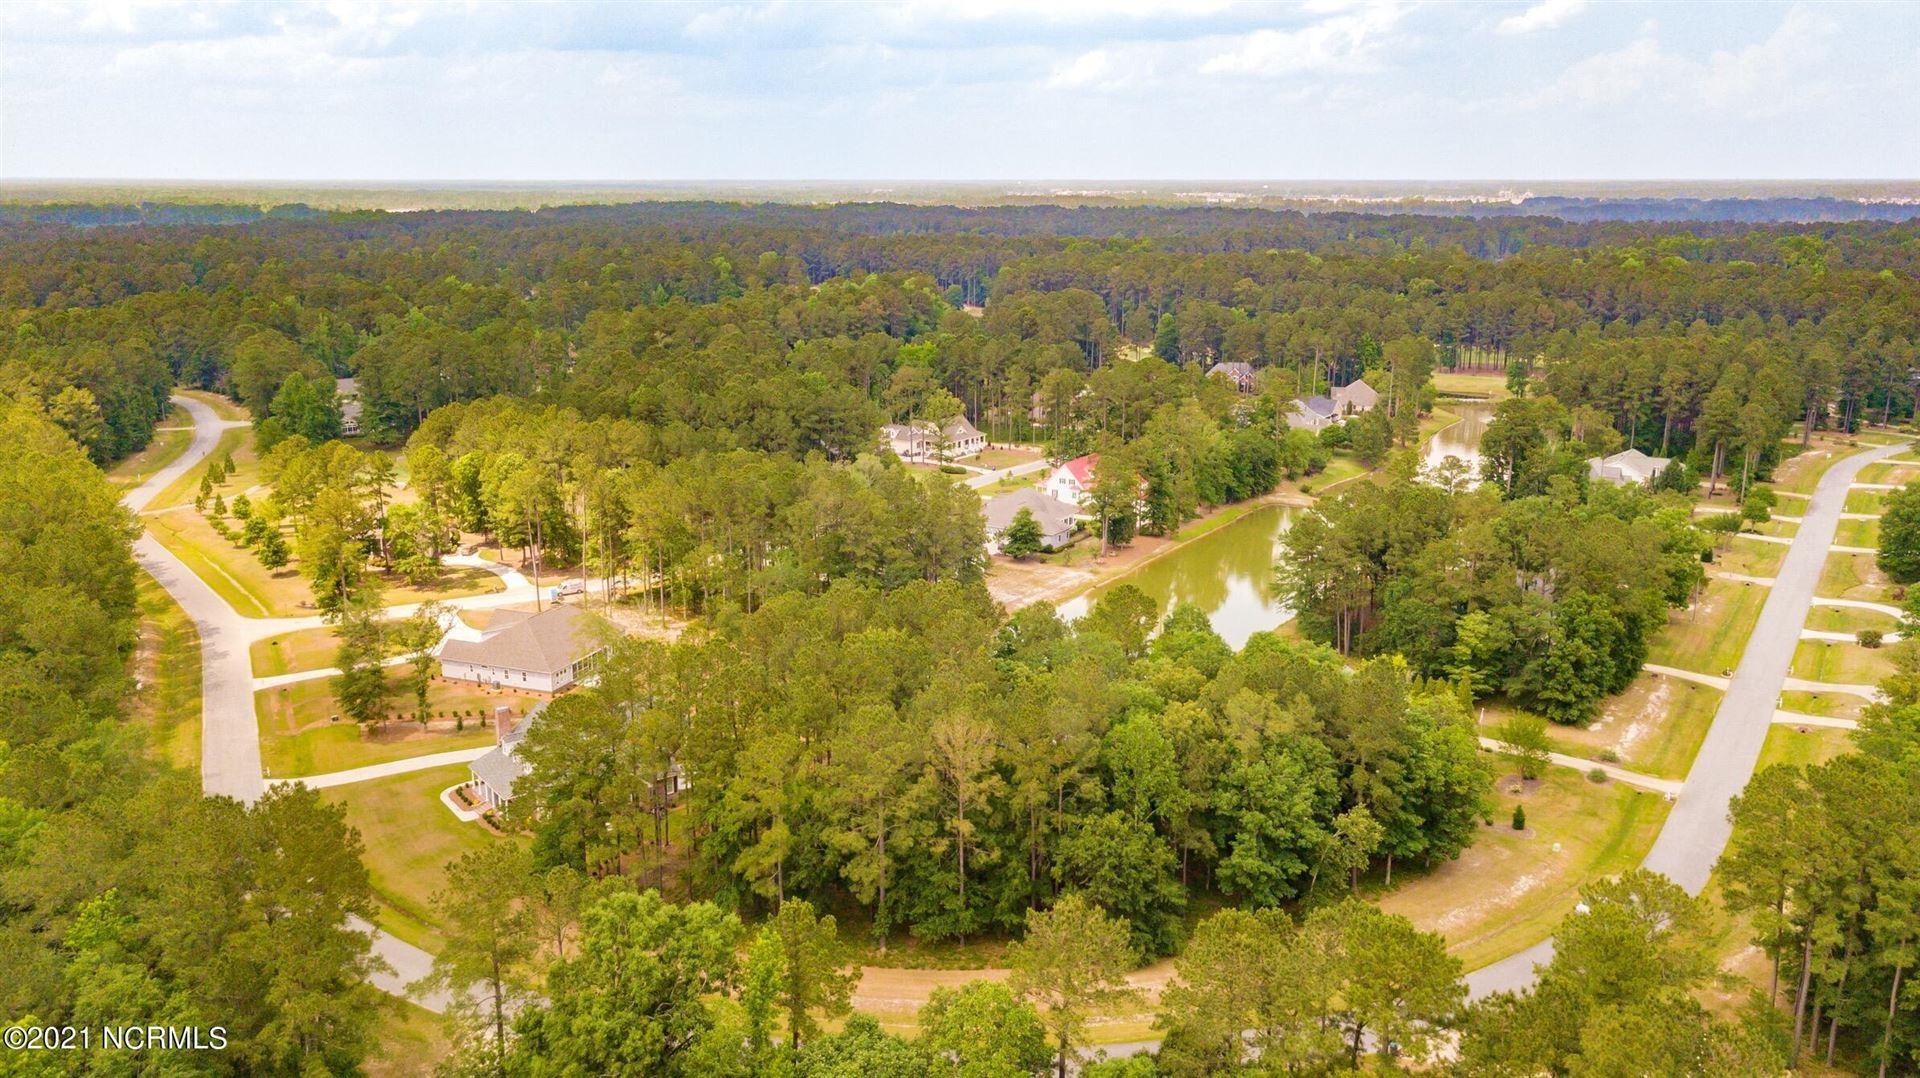 Photo of 113 Cypress Landing Trail, Chocowinity, NC 27817 (MLS # 100272055)